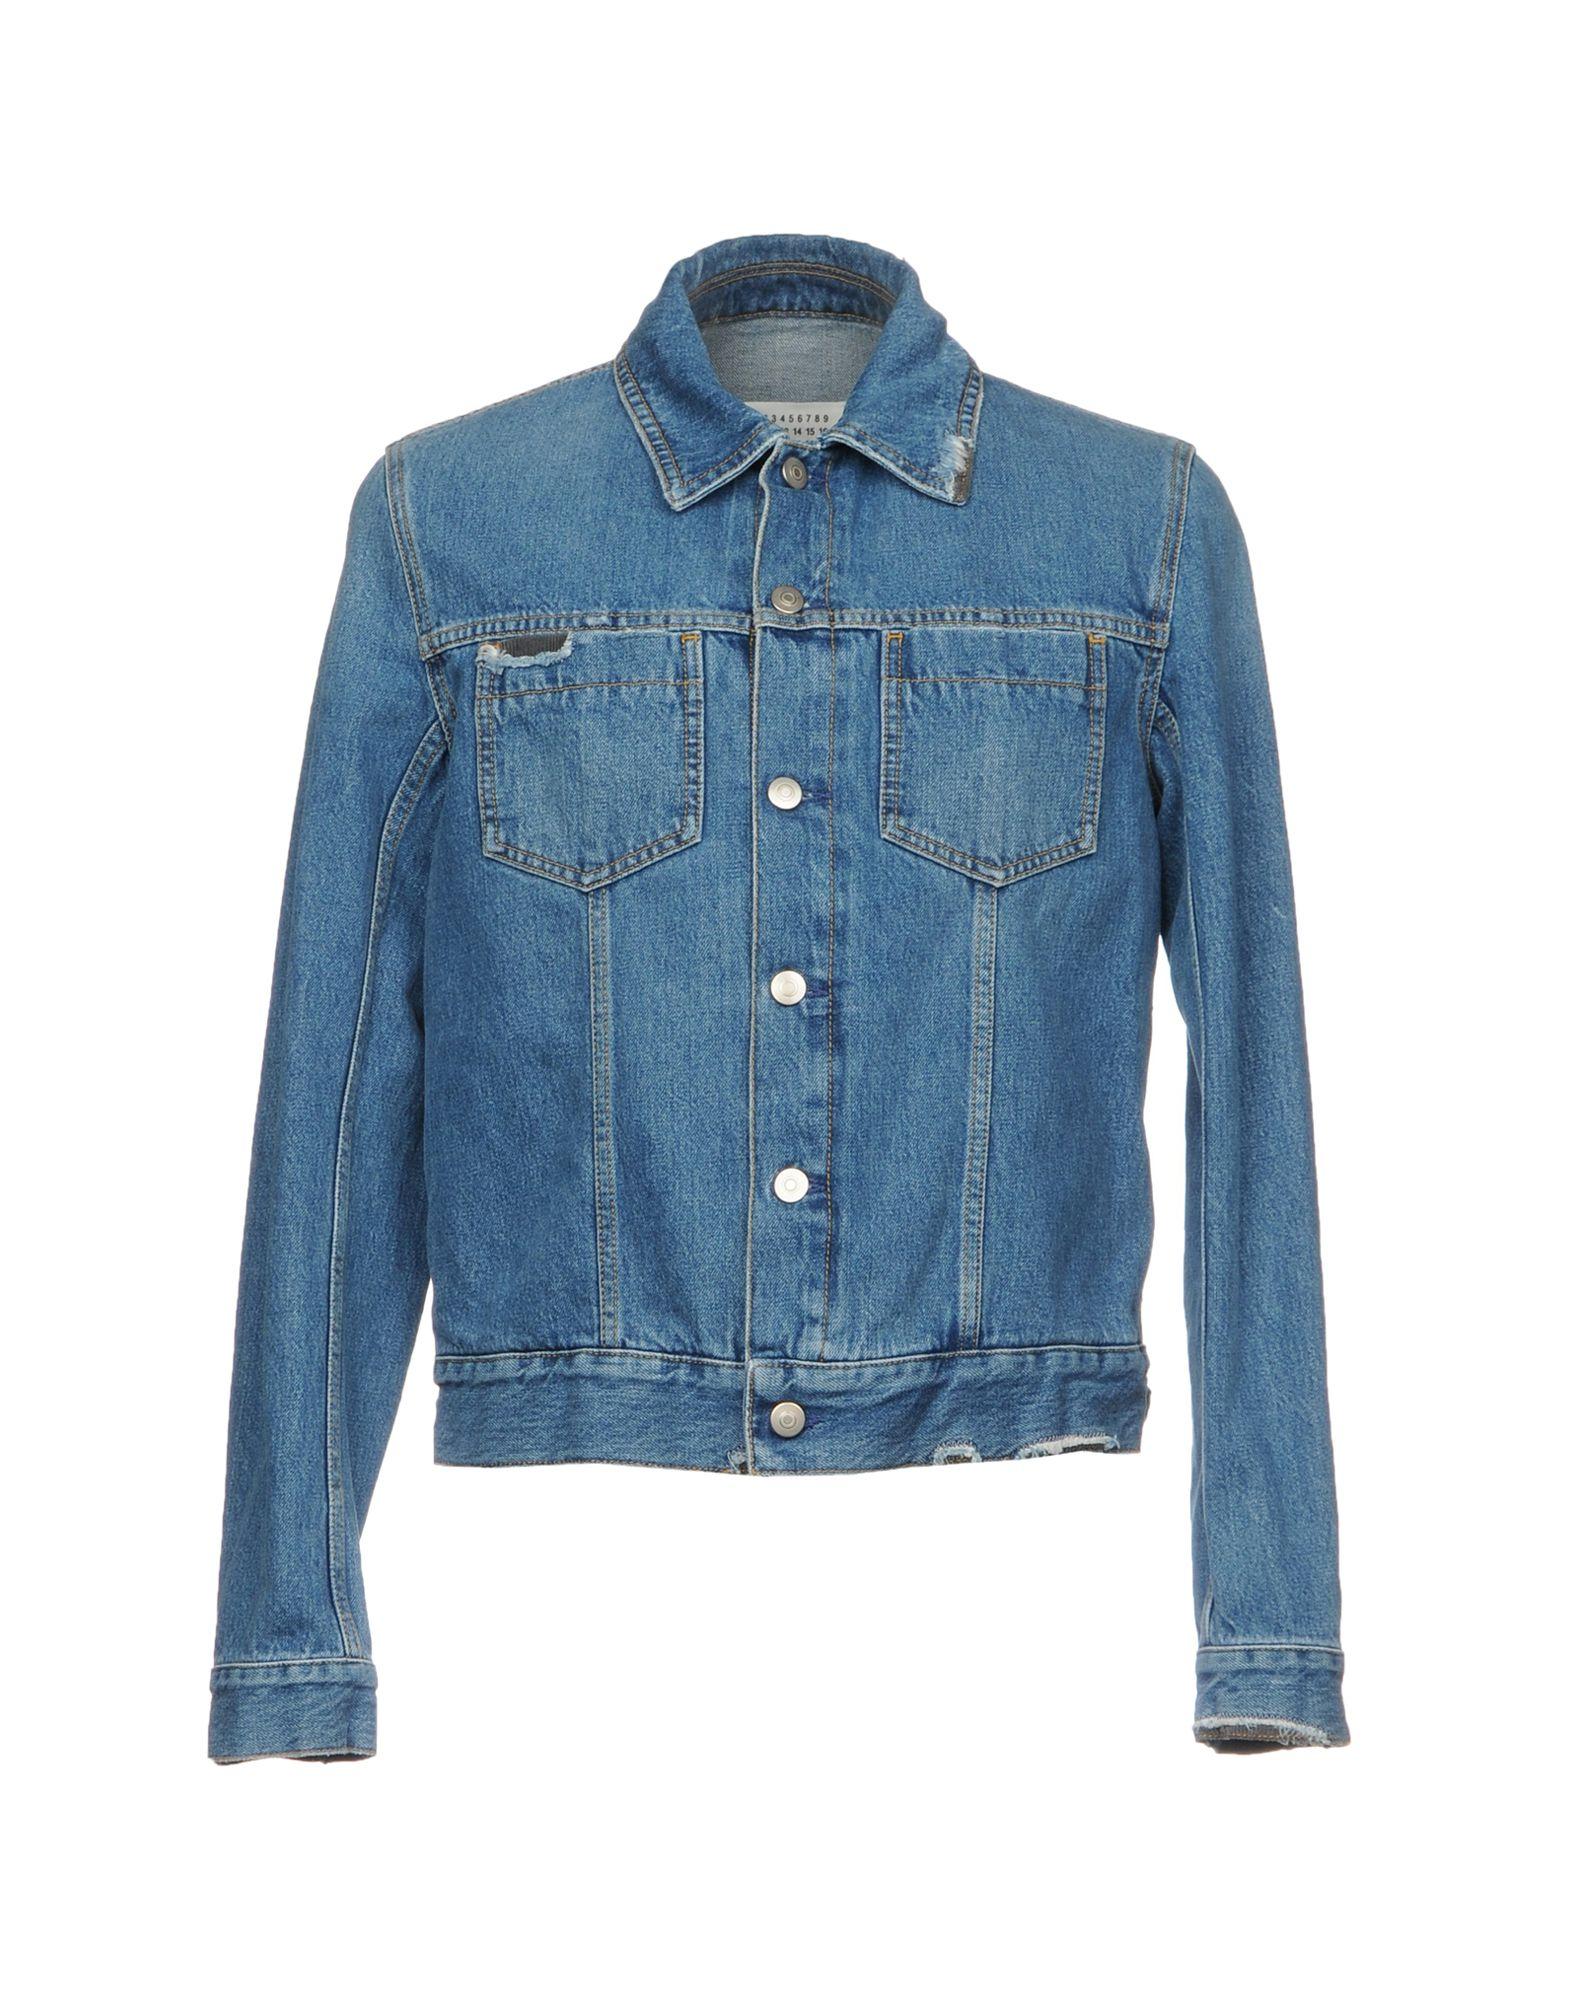 Giubbotto Jeans Maison Margiela Uomo - Acquista online su